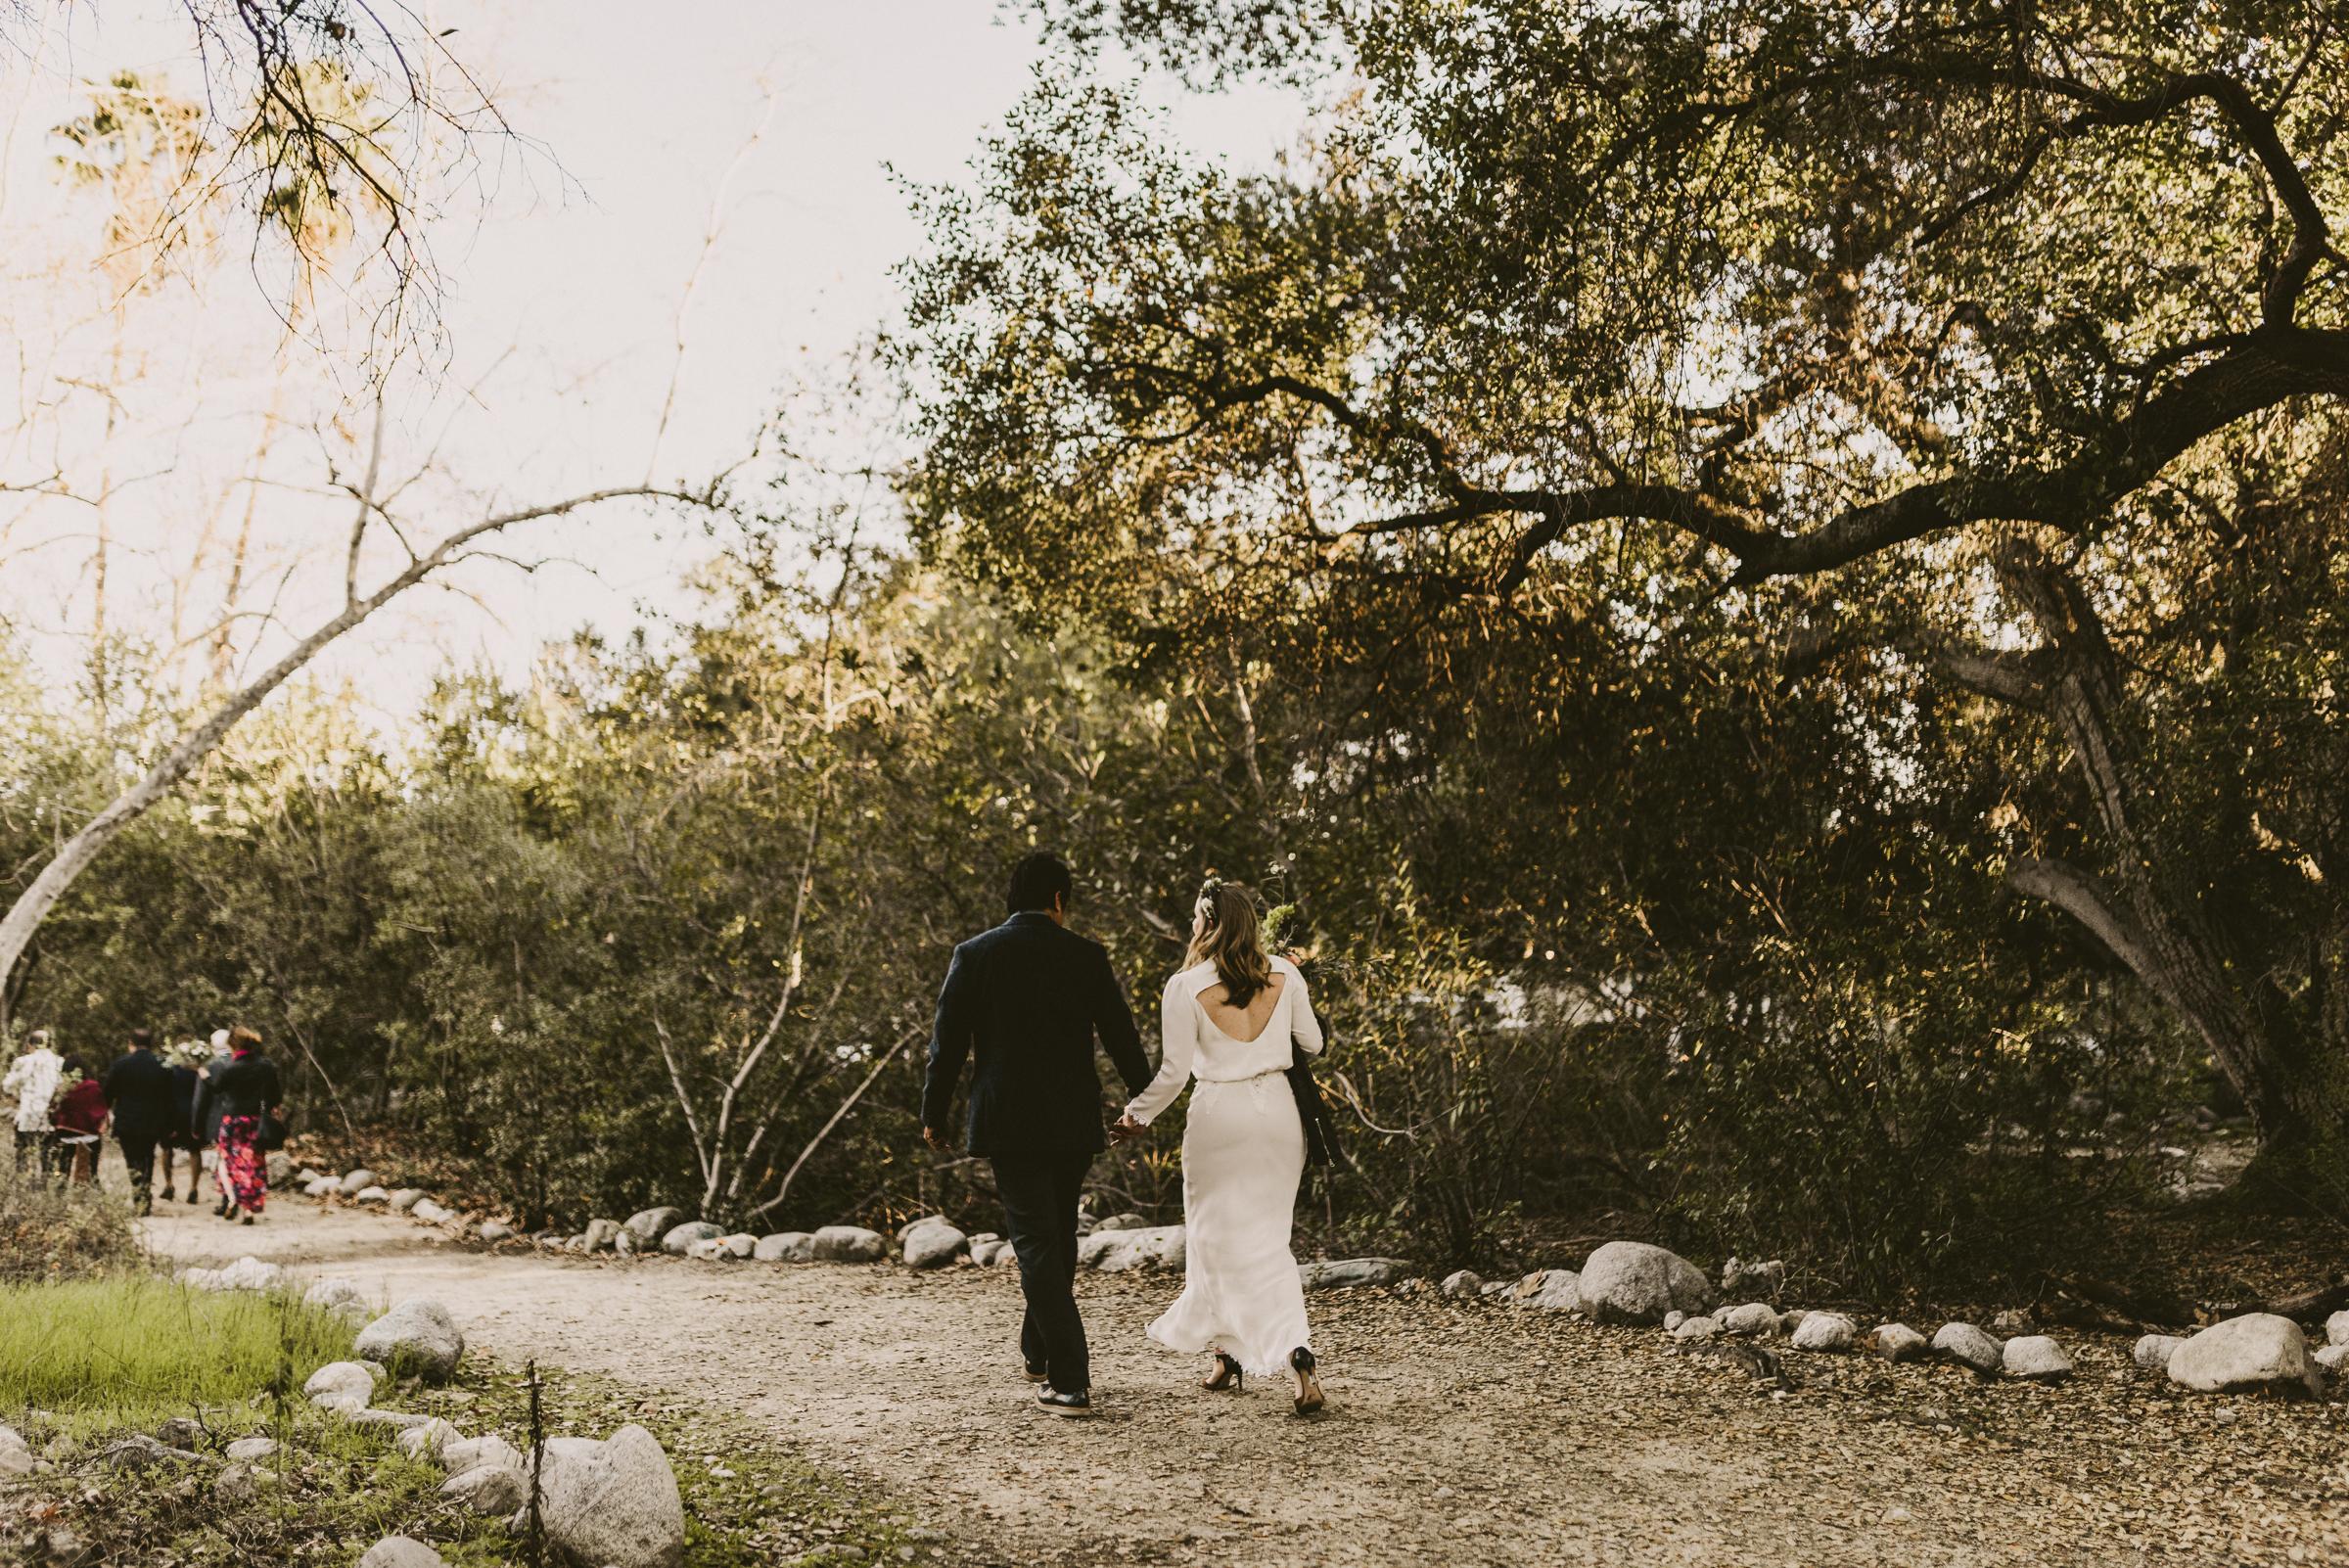 ©Isaiah + Taylor Photography - Intimate Elopement, Eaton Canyon, Los Angeles Wedding Photographer-57.jpg